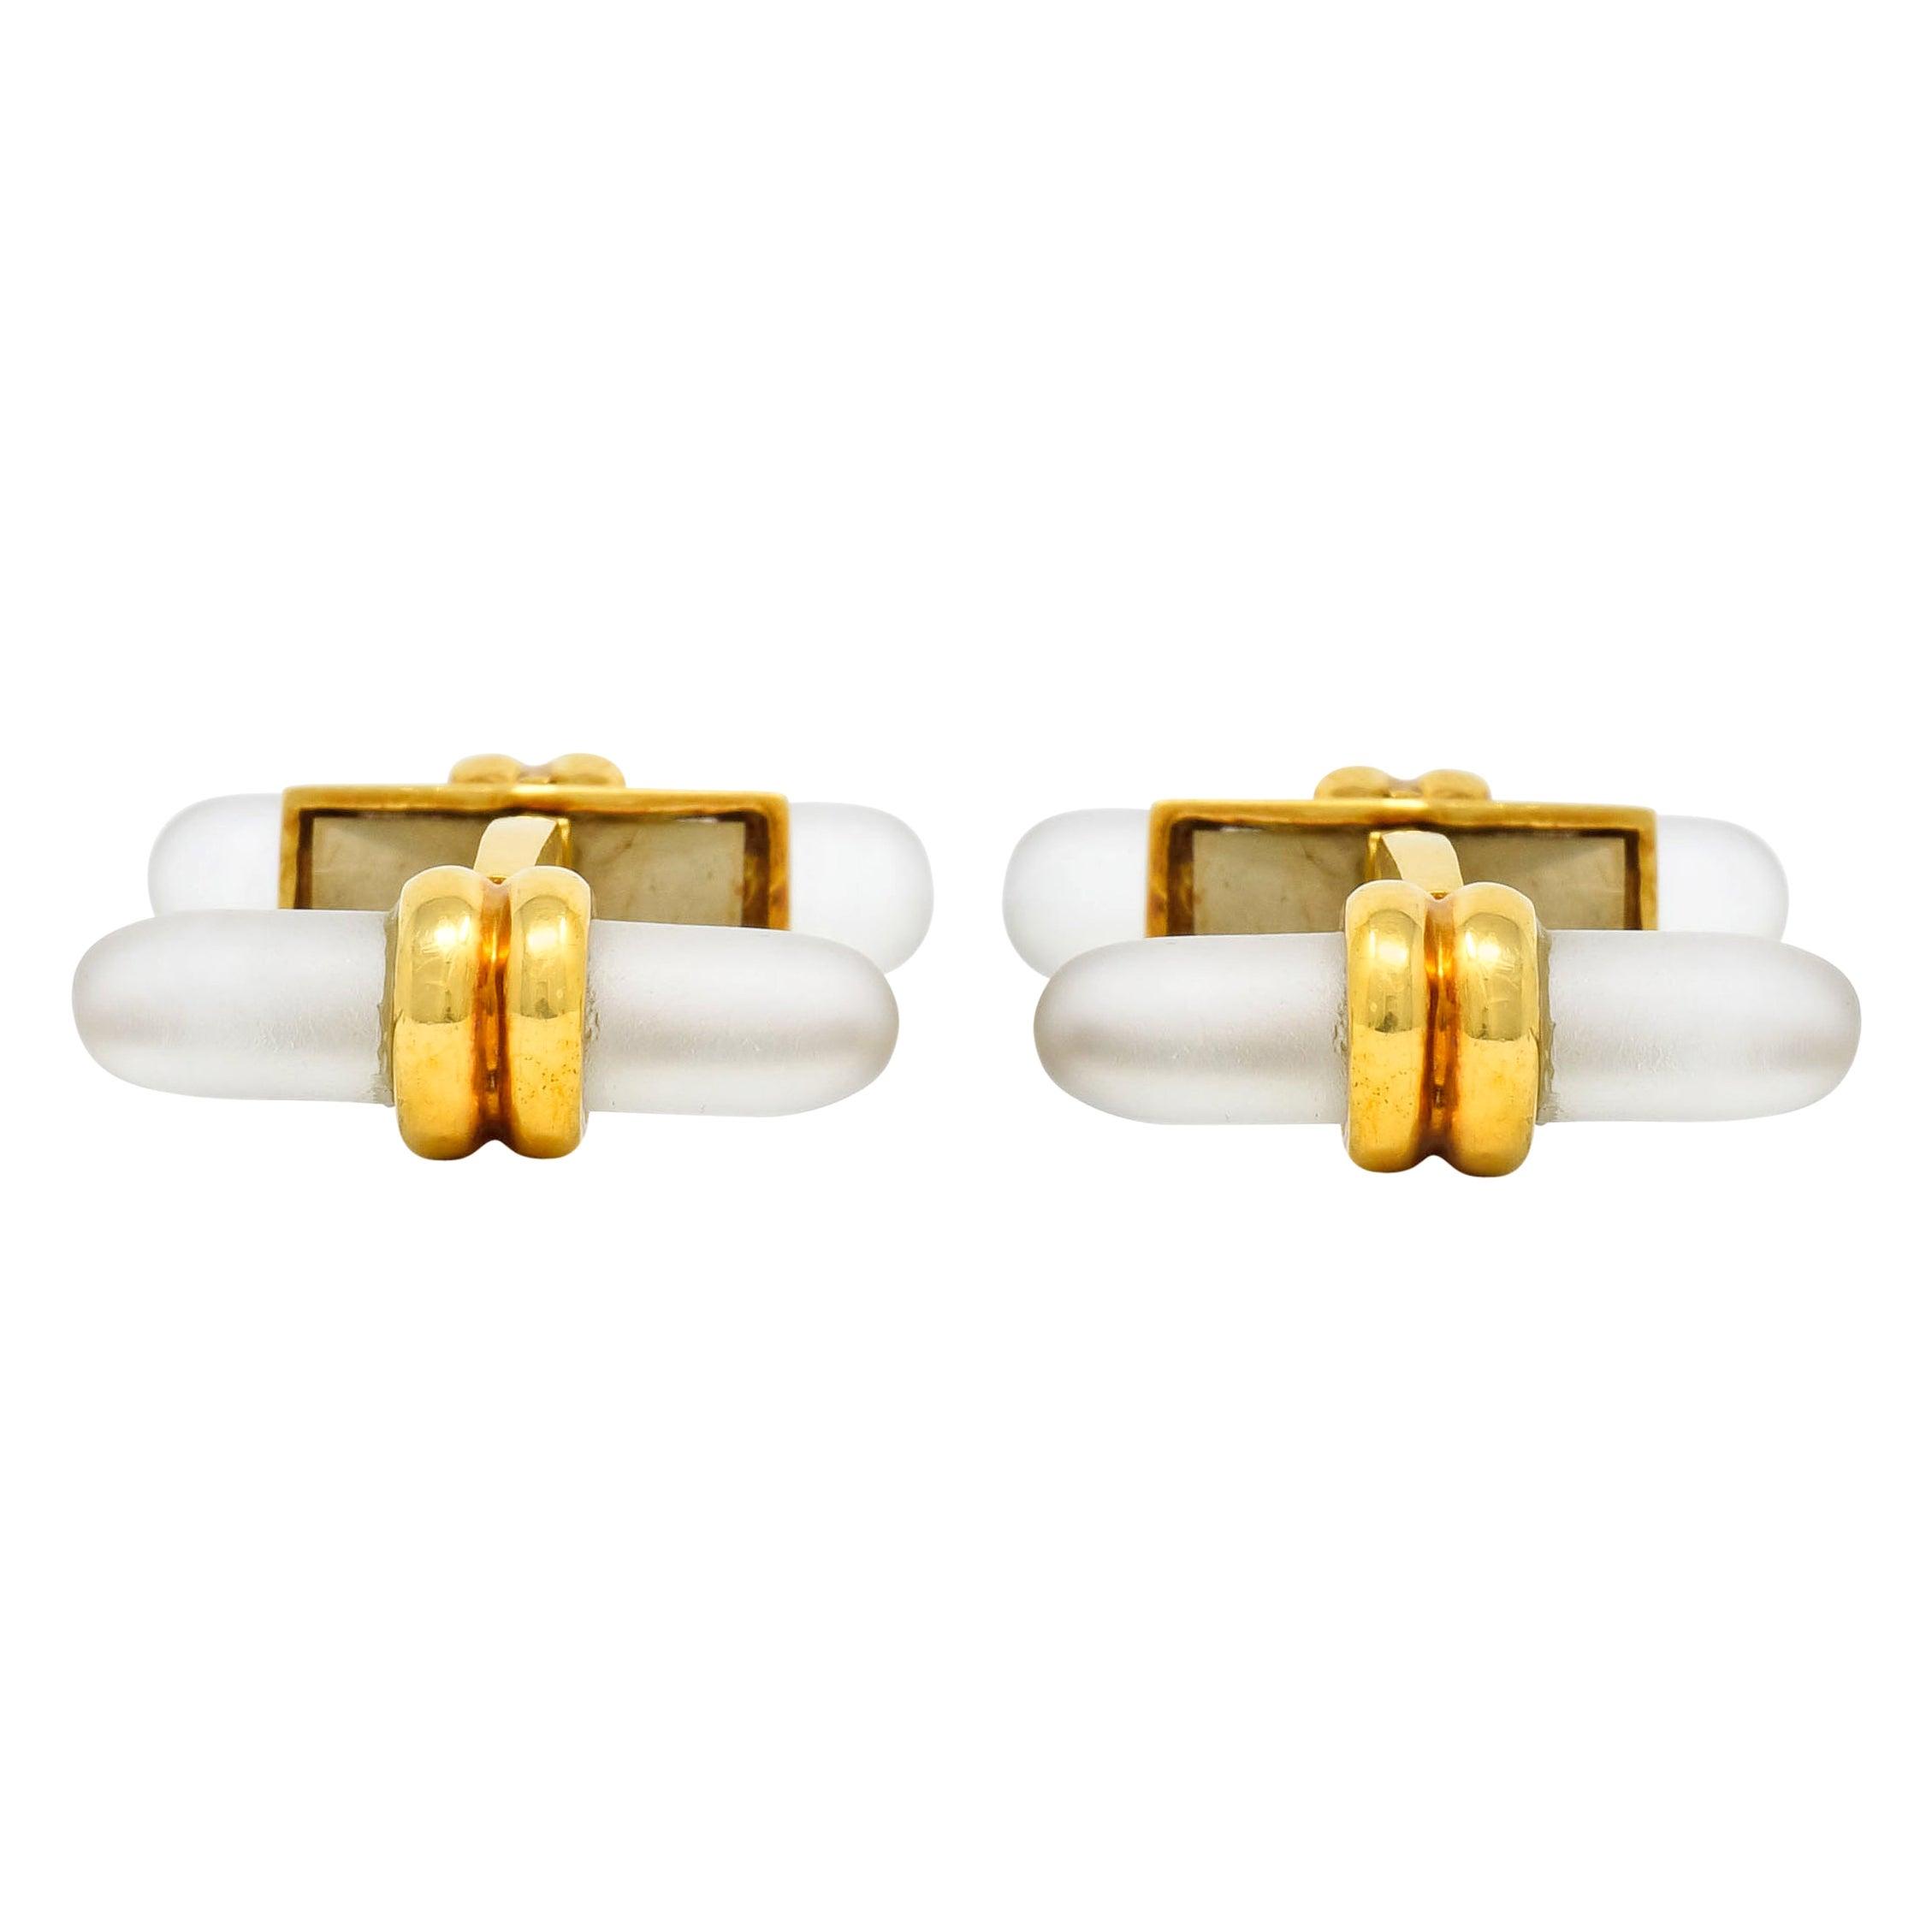 Tiffany & Co. French Rock Crystal 18 Karat Gold Men's Cufflinks